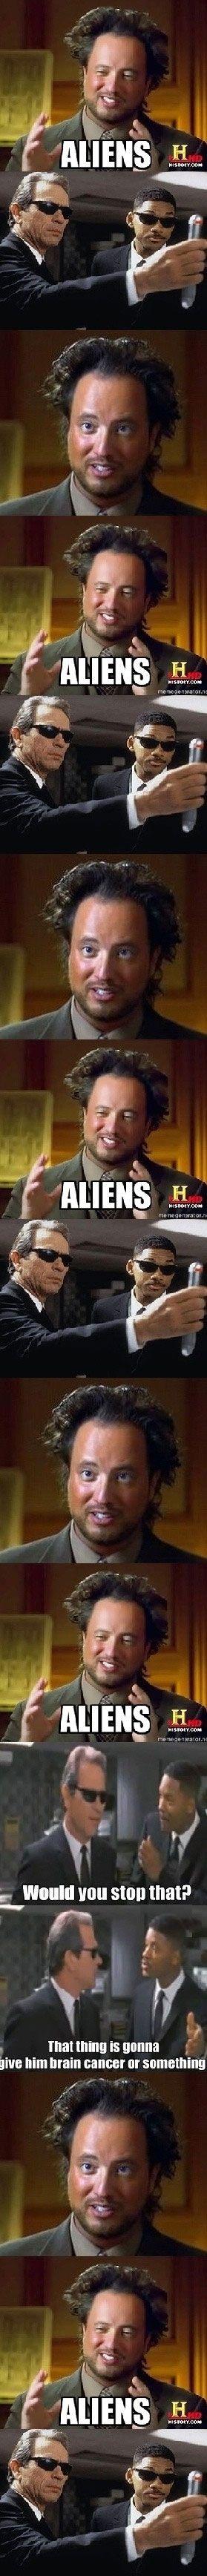 MIB meets the Aliens Guy